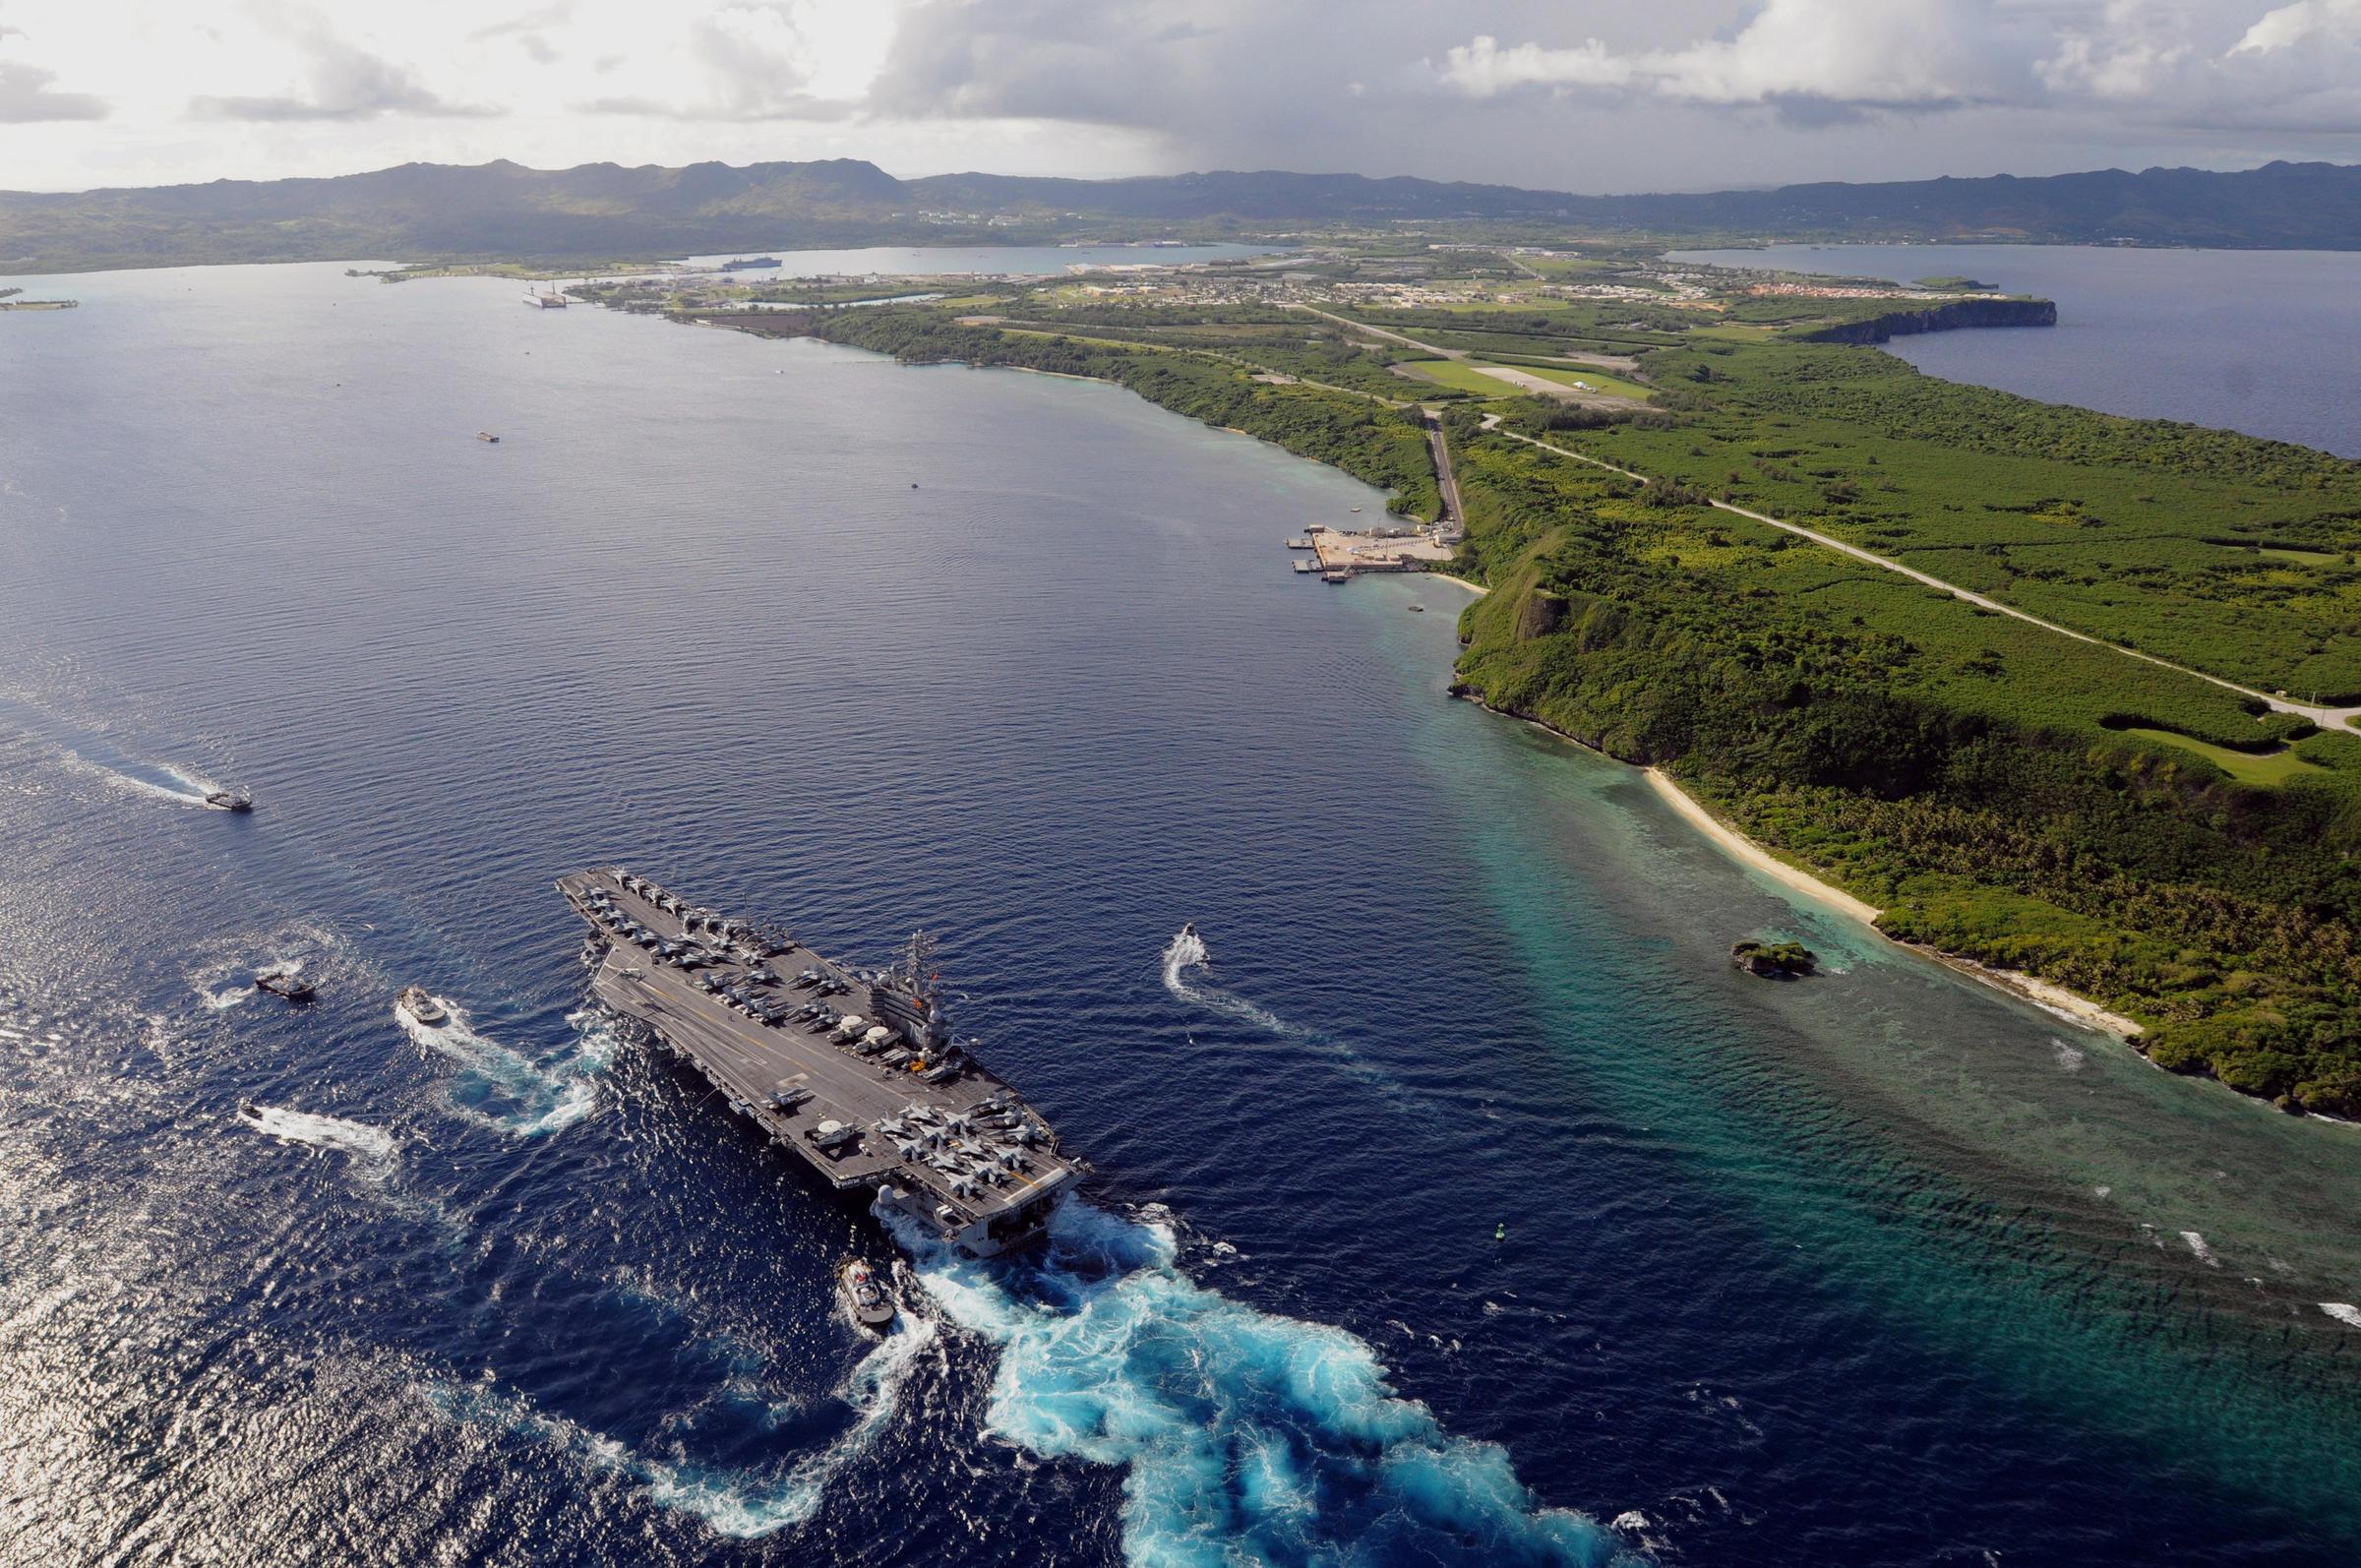 Pacific Island Mania